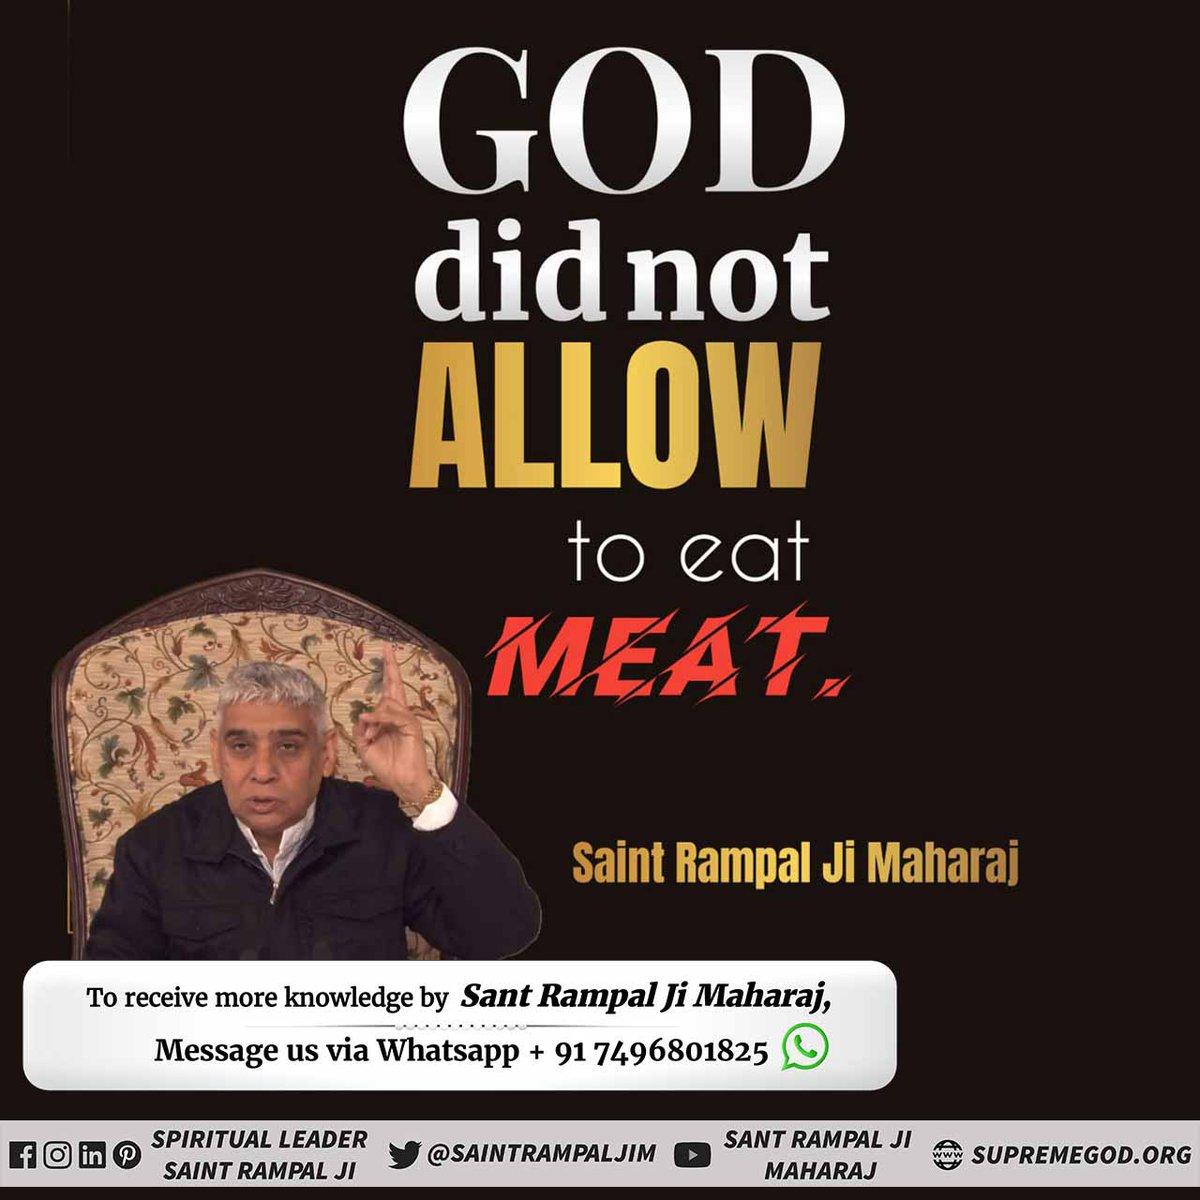 @#EidAlAdha #Allah_DidntAllow_Qurbani  One who eats meat attains hell, regardless of any living being.   Kabir ji explains-  Maas maas sab ek hai, murgi hirni gaye. Aankh dekh kar nar khat hai, te nar narak hi jaye.  https://t.co/keBOAlShTD https://t.co/jAlkdIUt8y